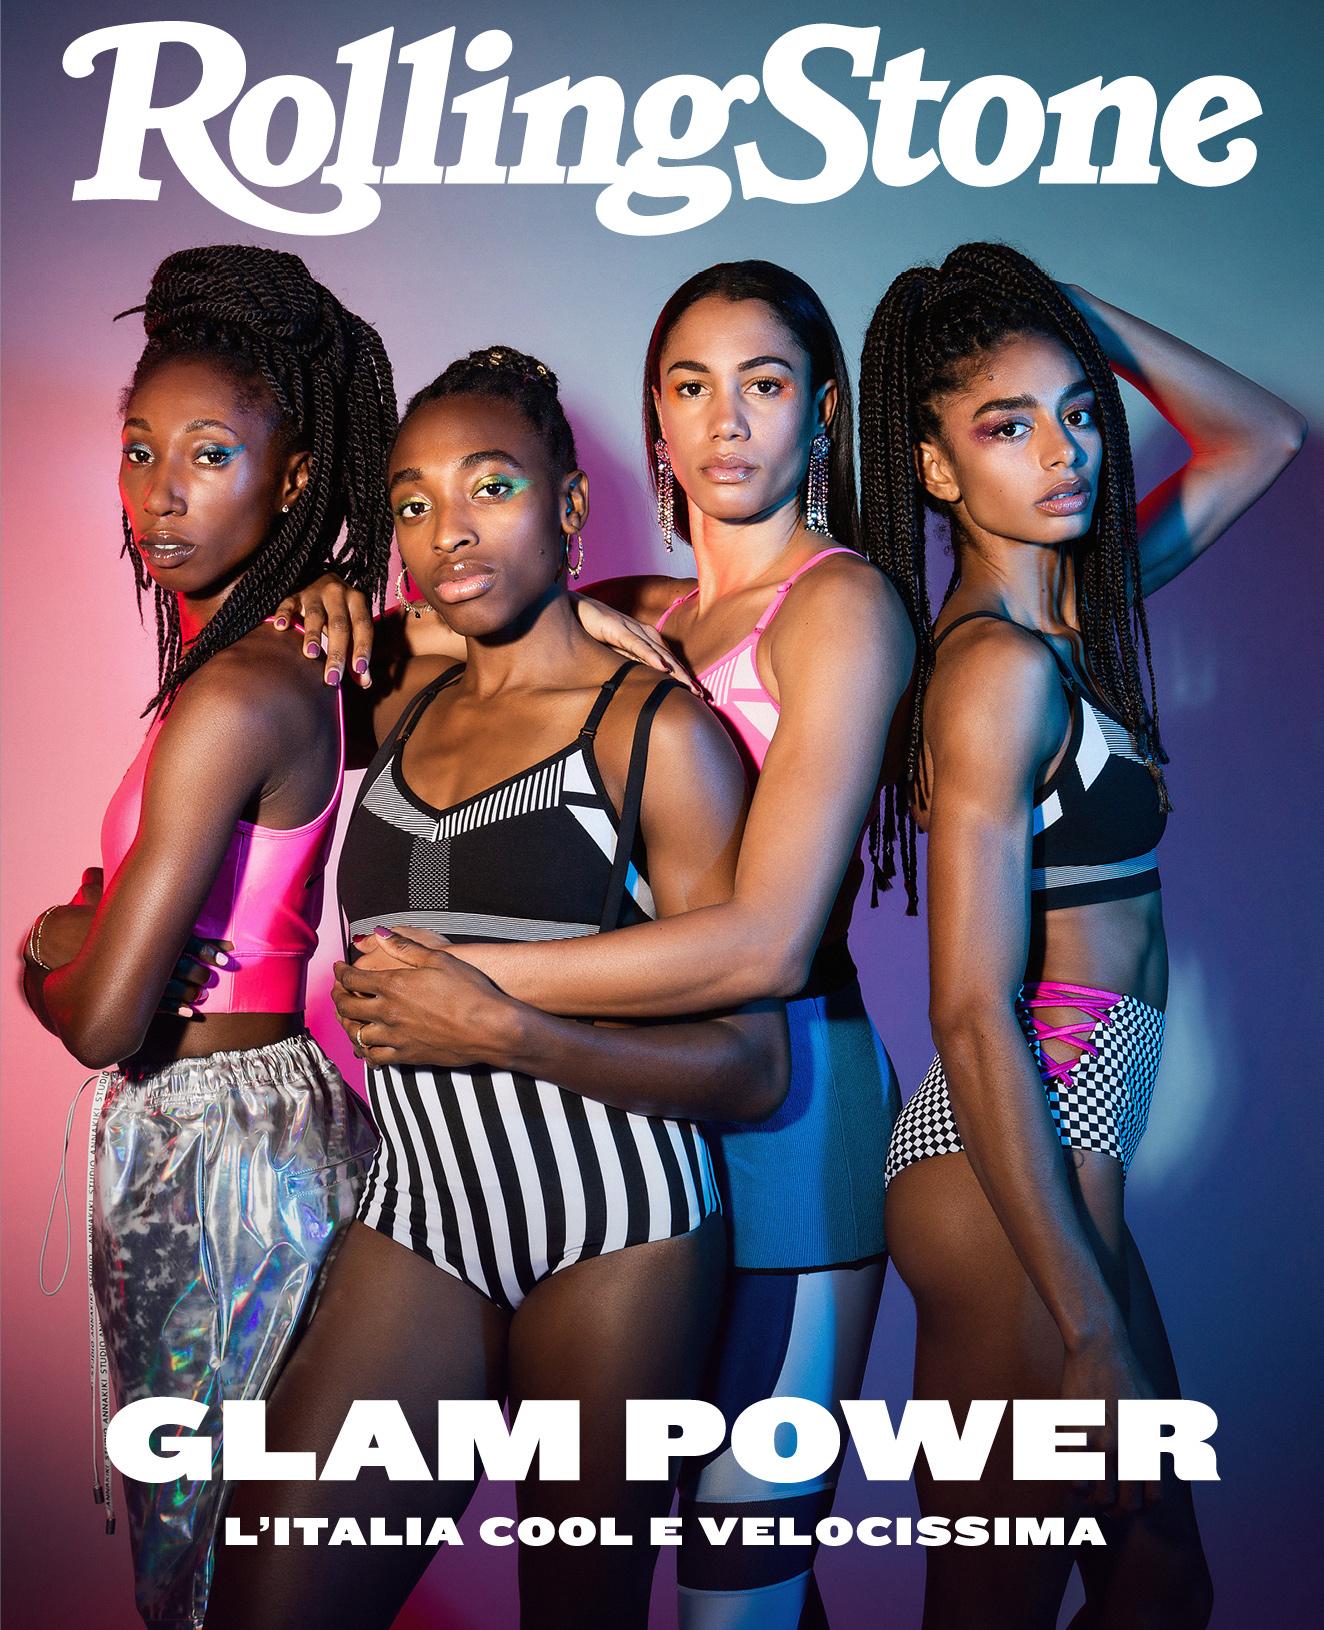 Da sinistra a destra Chigbolu, Folorunso, Grenot e Lukudo per Rolling Stone Italia